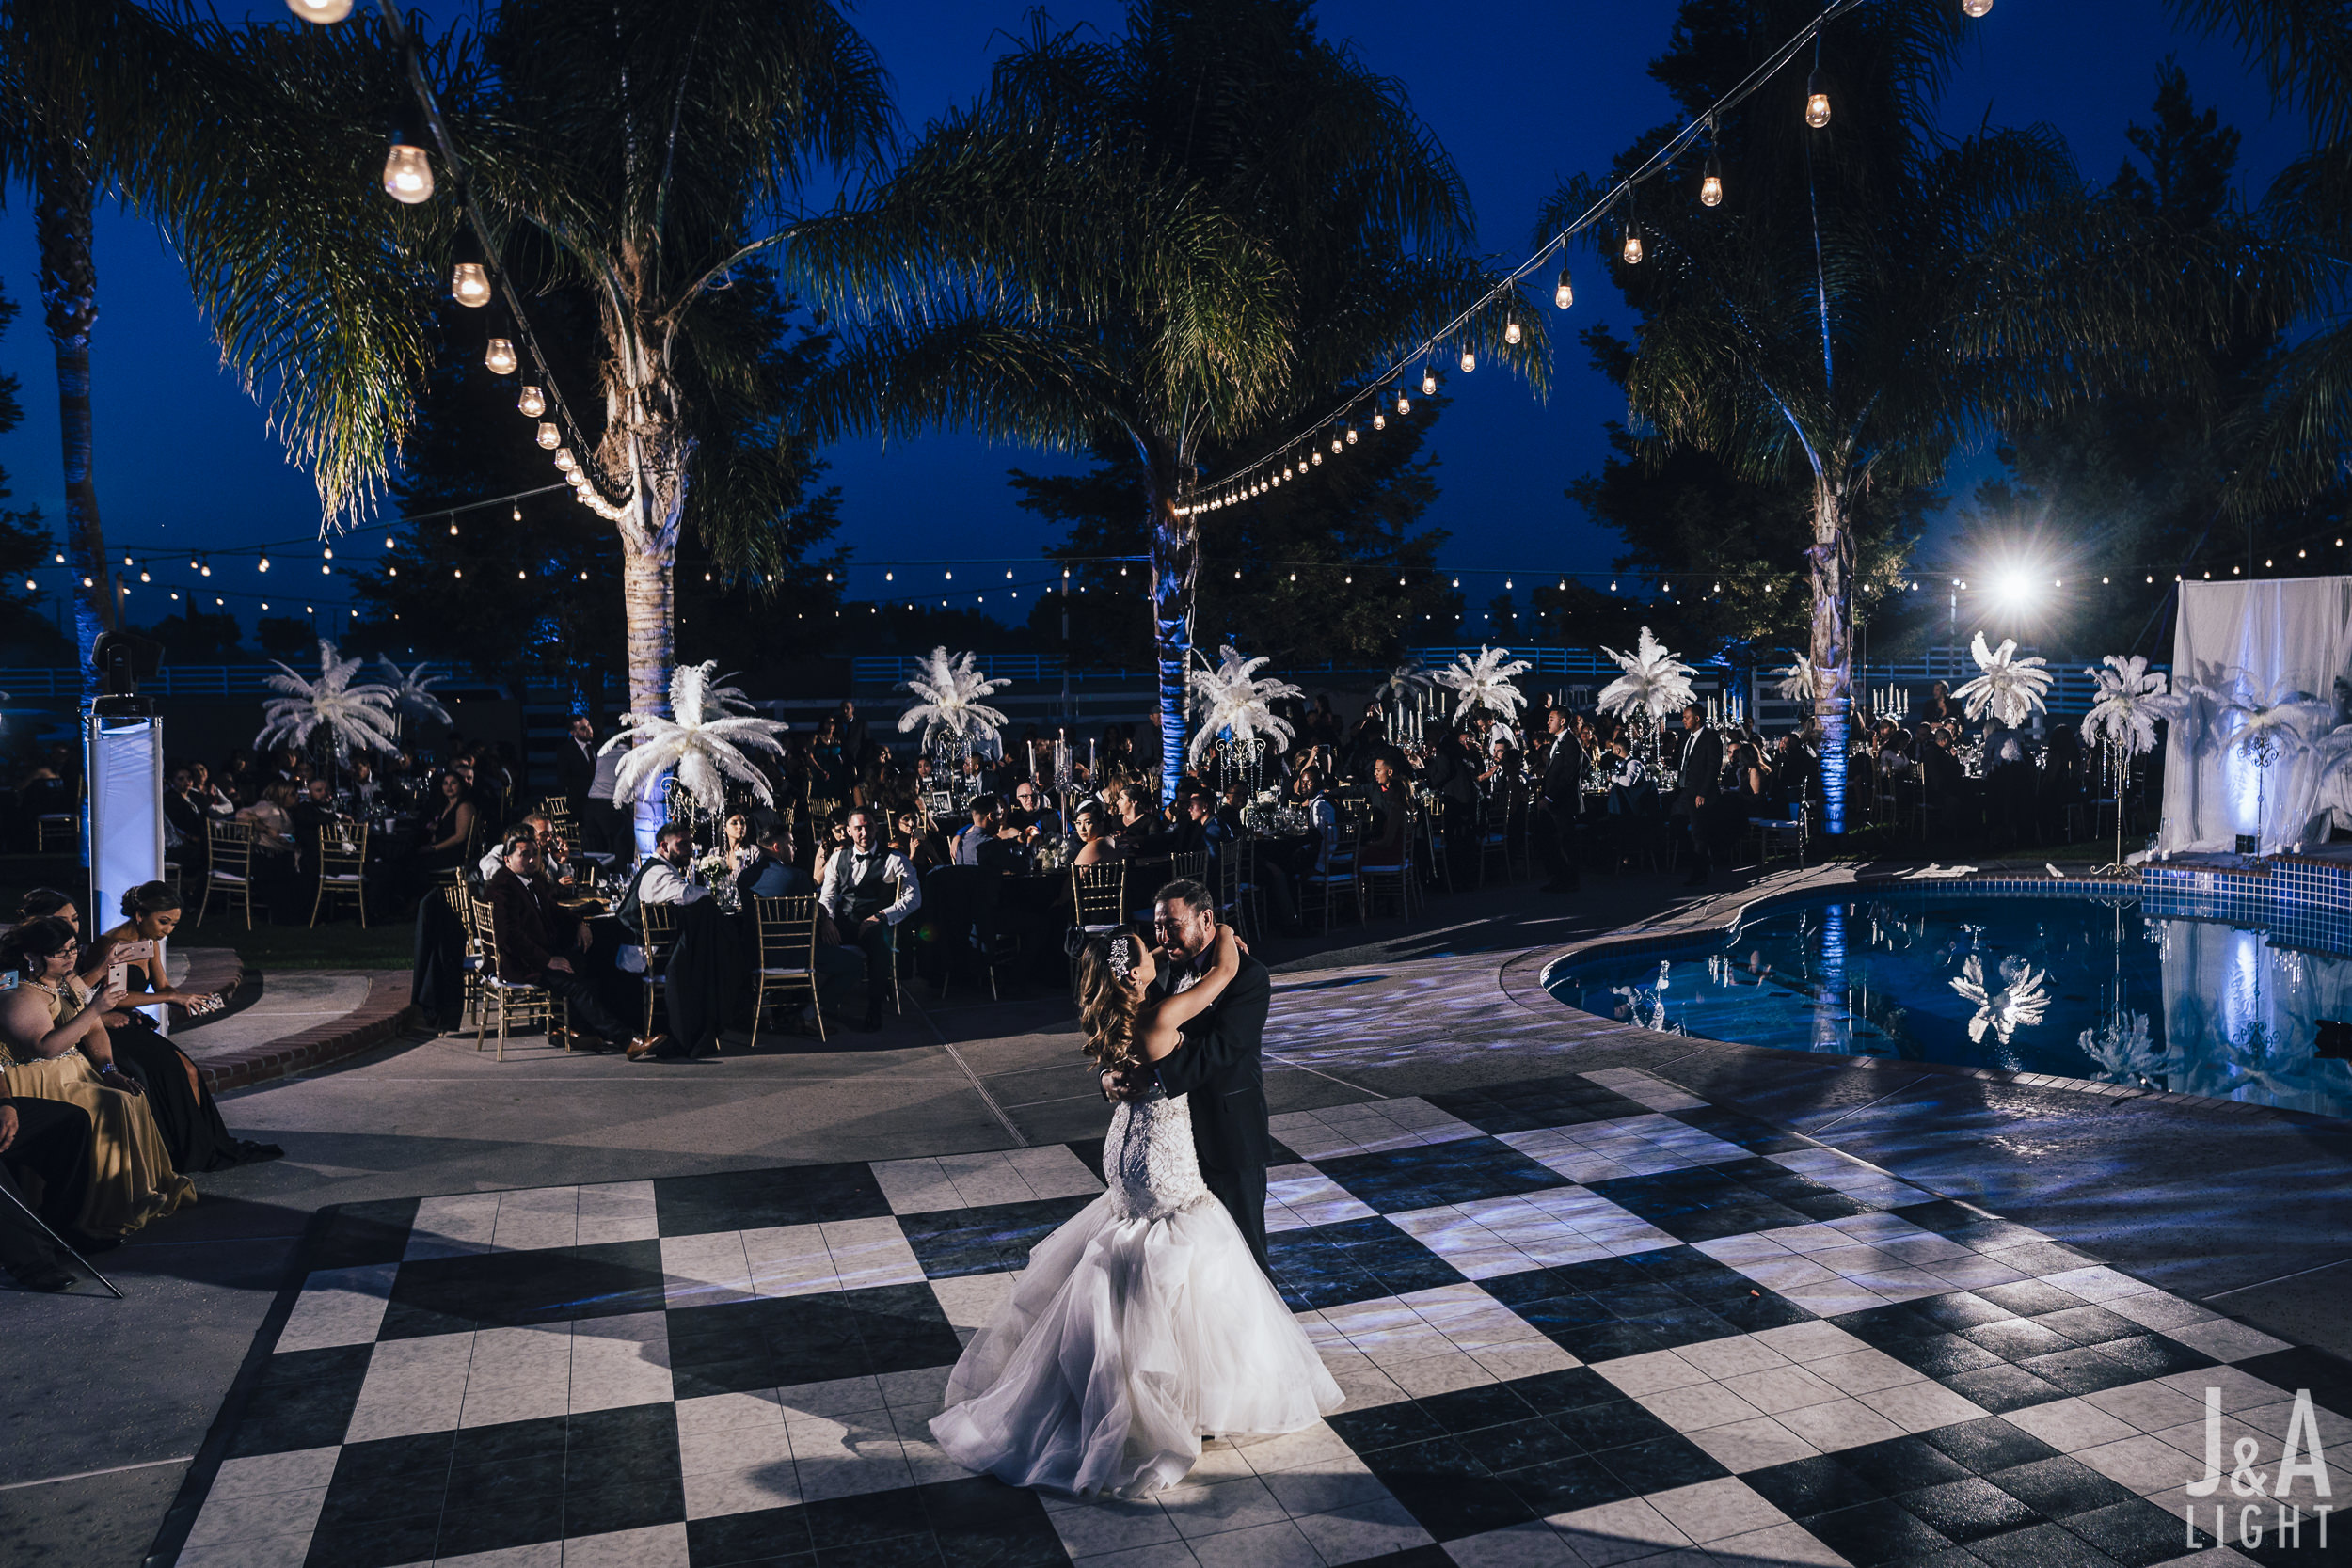 20171014-JanDan-LosBanos-GlassMansion-Wedding-Blog-066.jpg